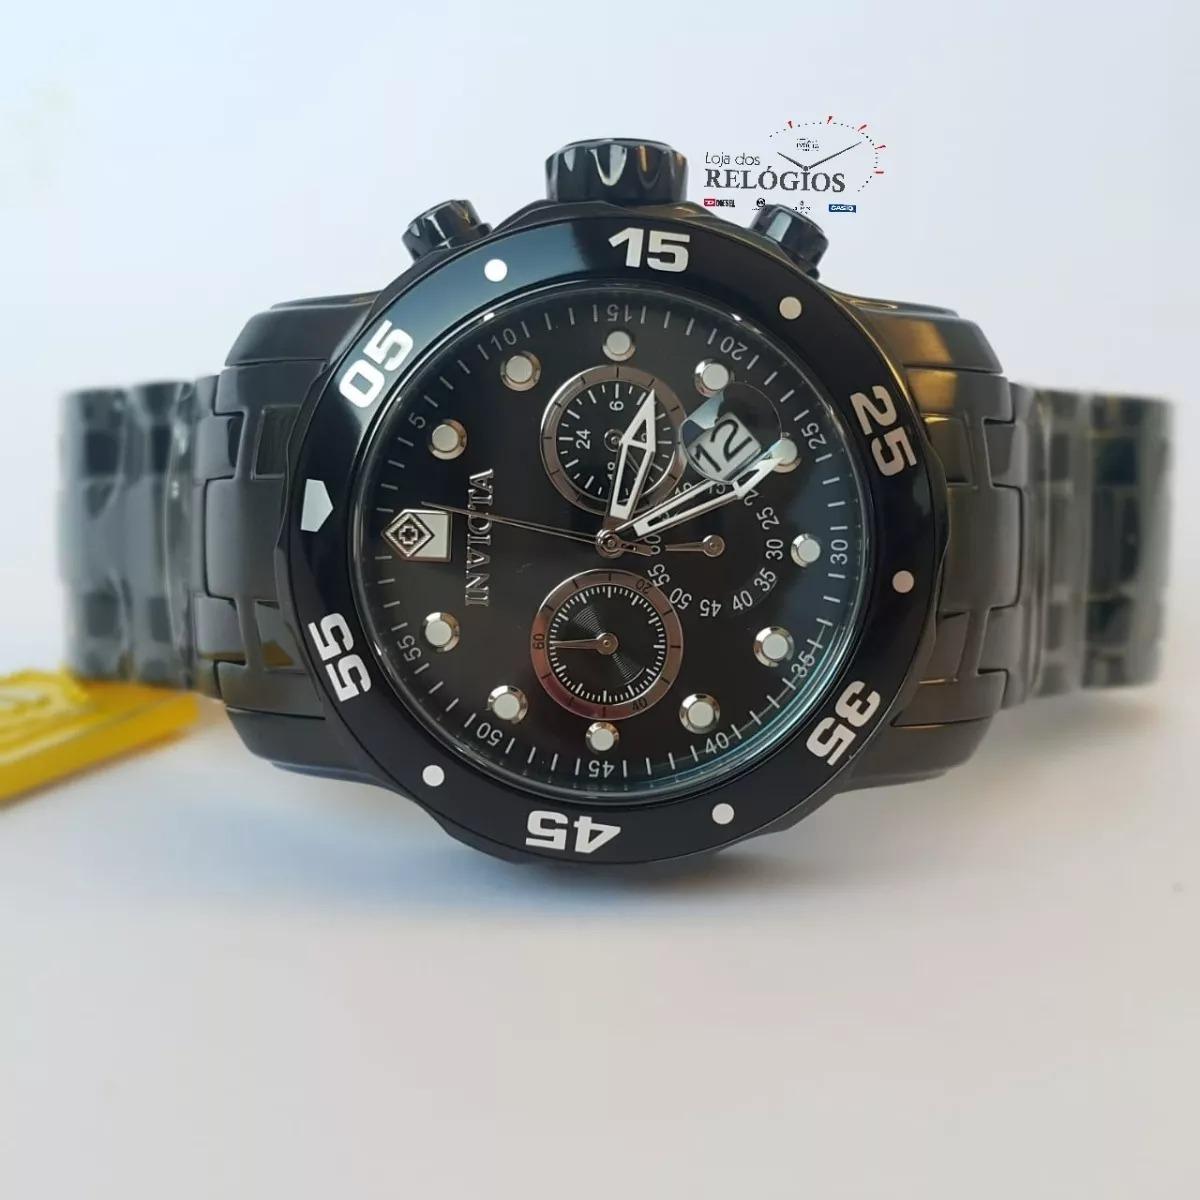 1c90a54b9a3 relógio invicta pro diver 0076 21926 preto original + brinde. Carregando  zoom.